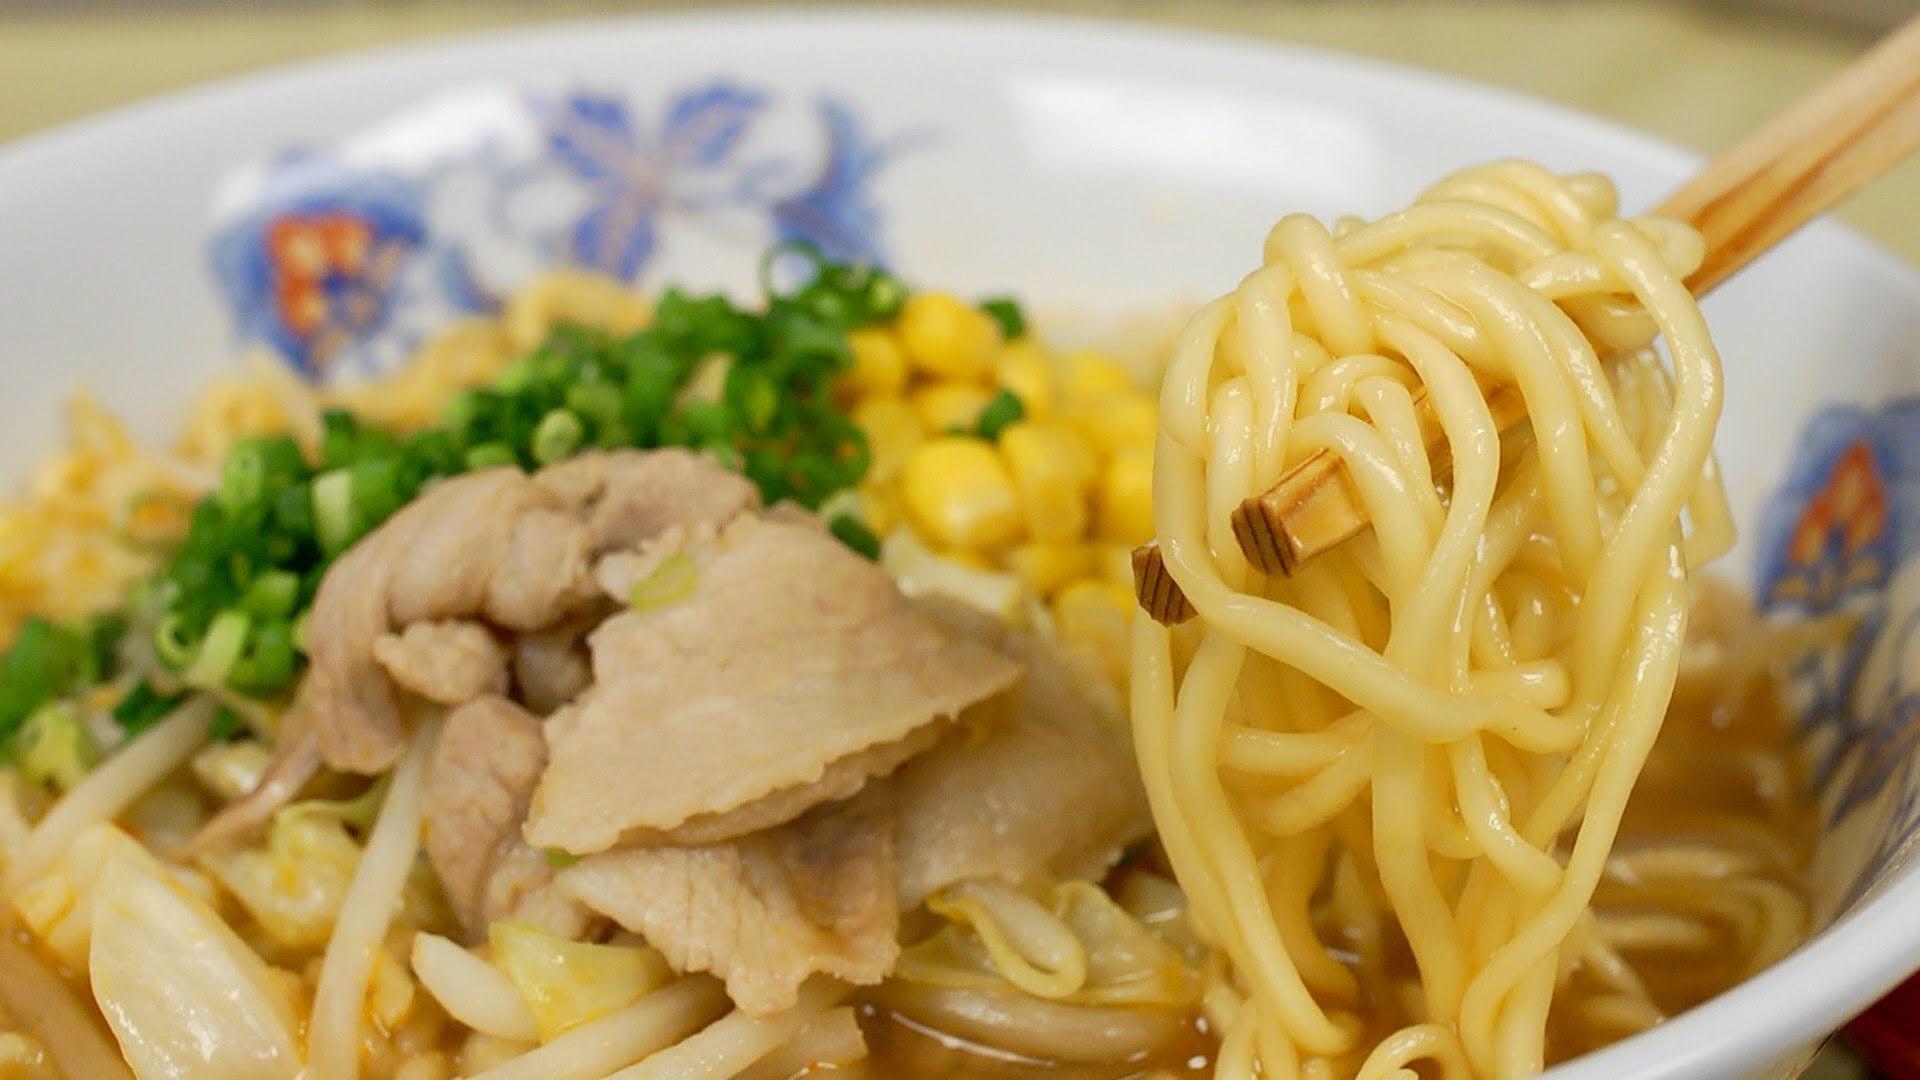 Miso Ramen Noodle Recipe 味噌ラーメン 作り方レシピ